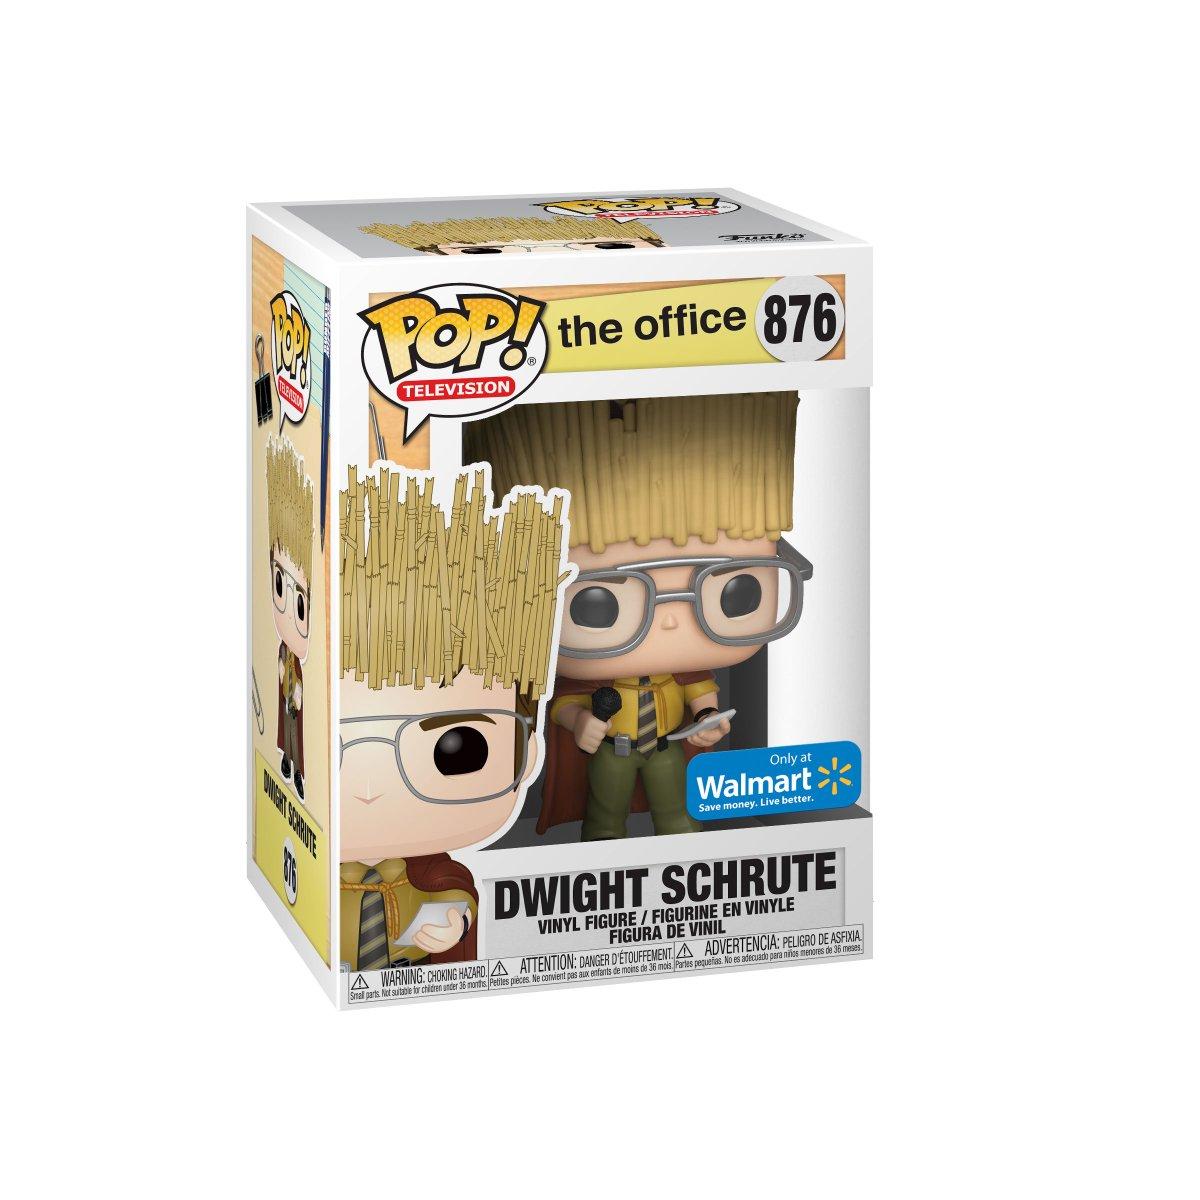 RT & follow @OriginalFunko for a chance to WIN a Walmart exclusive Dwight Schrute Pop!  #Funko #FunkoPop #Giveaway #TheOffice